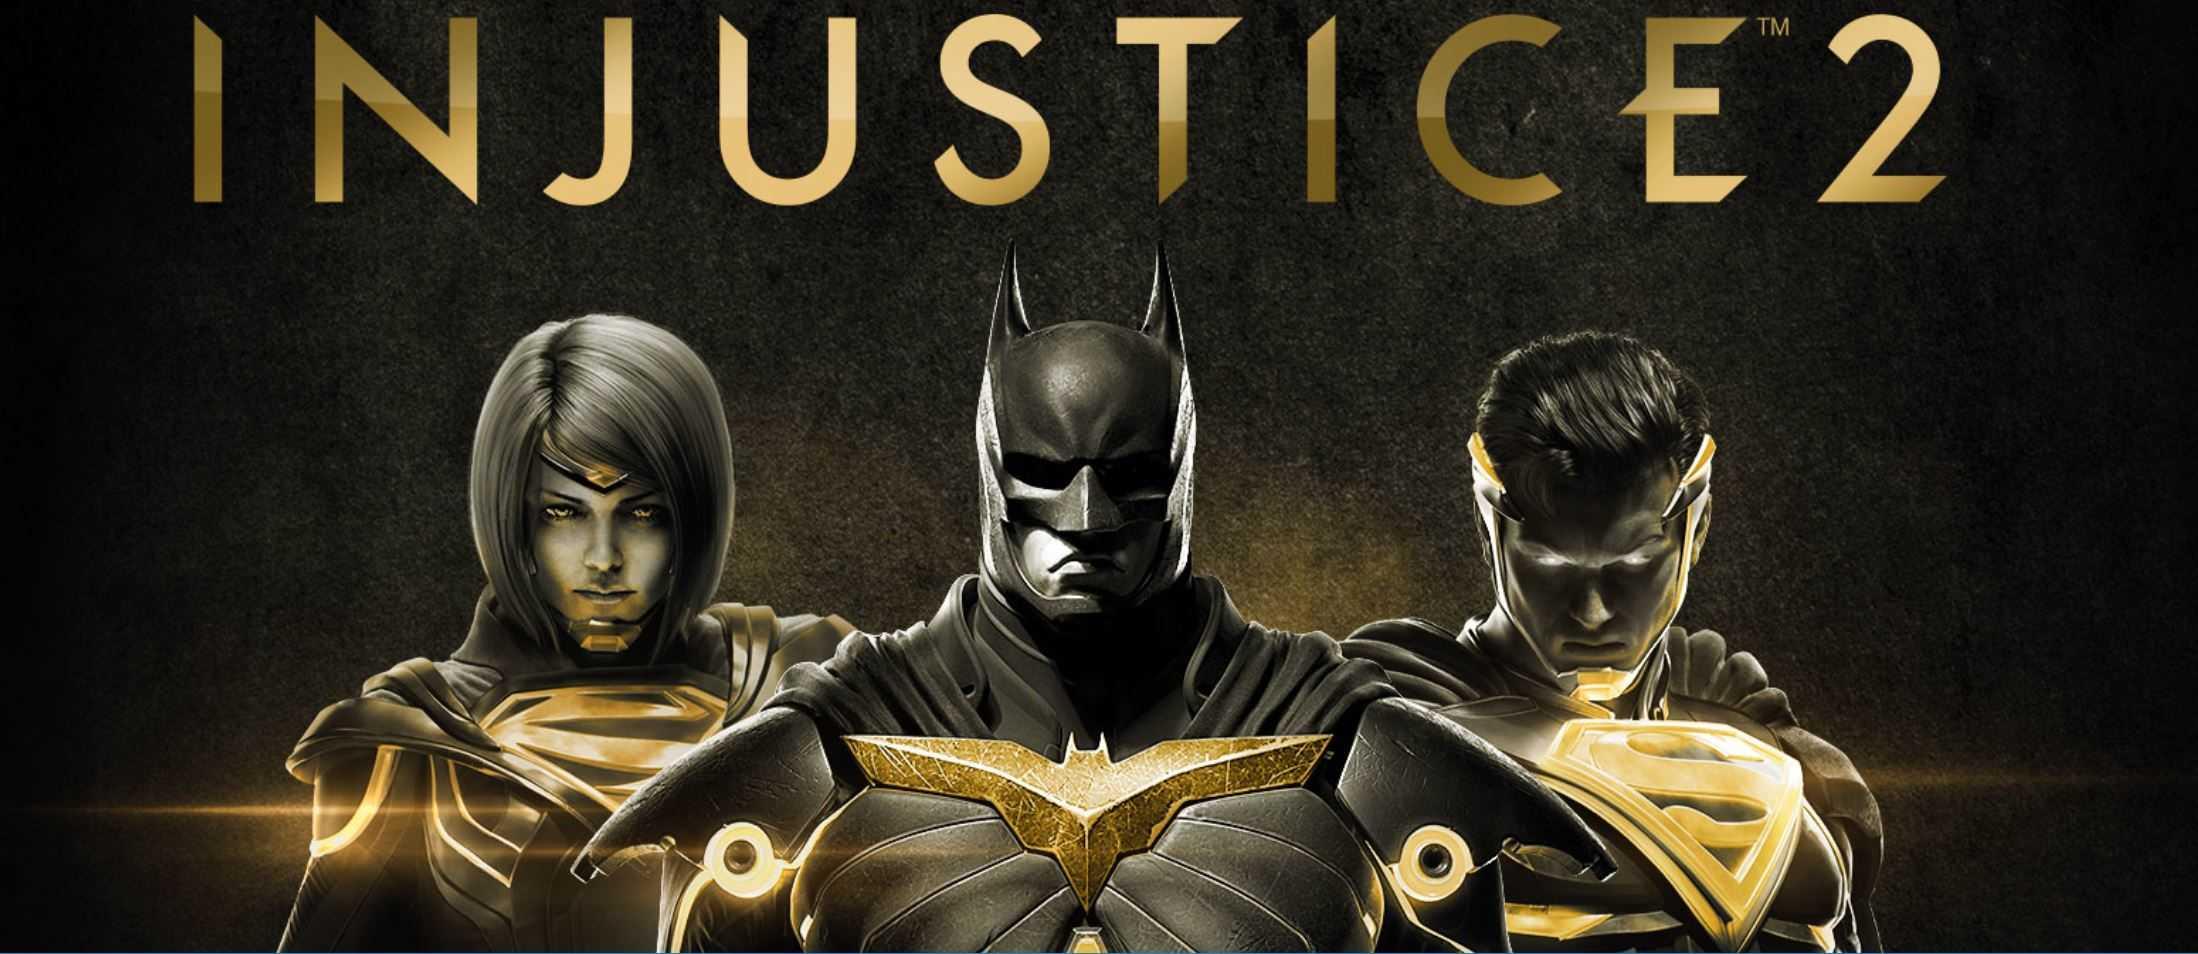 Warner Bros Annuncia Injustice 2 Legendary Edition PC